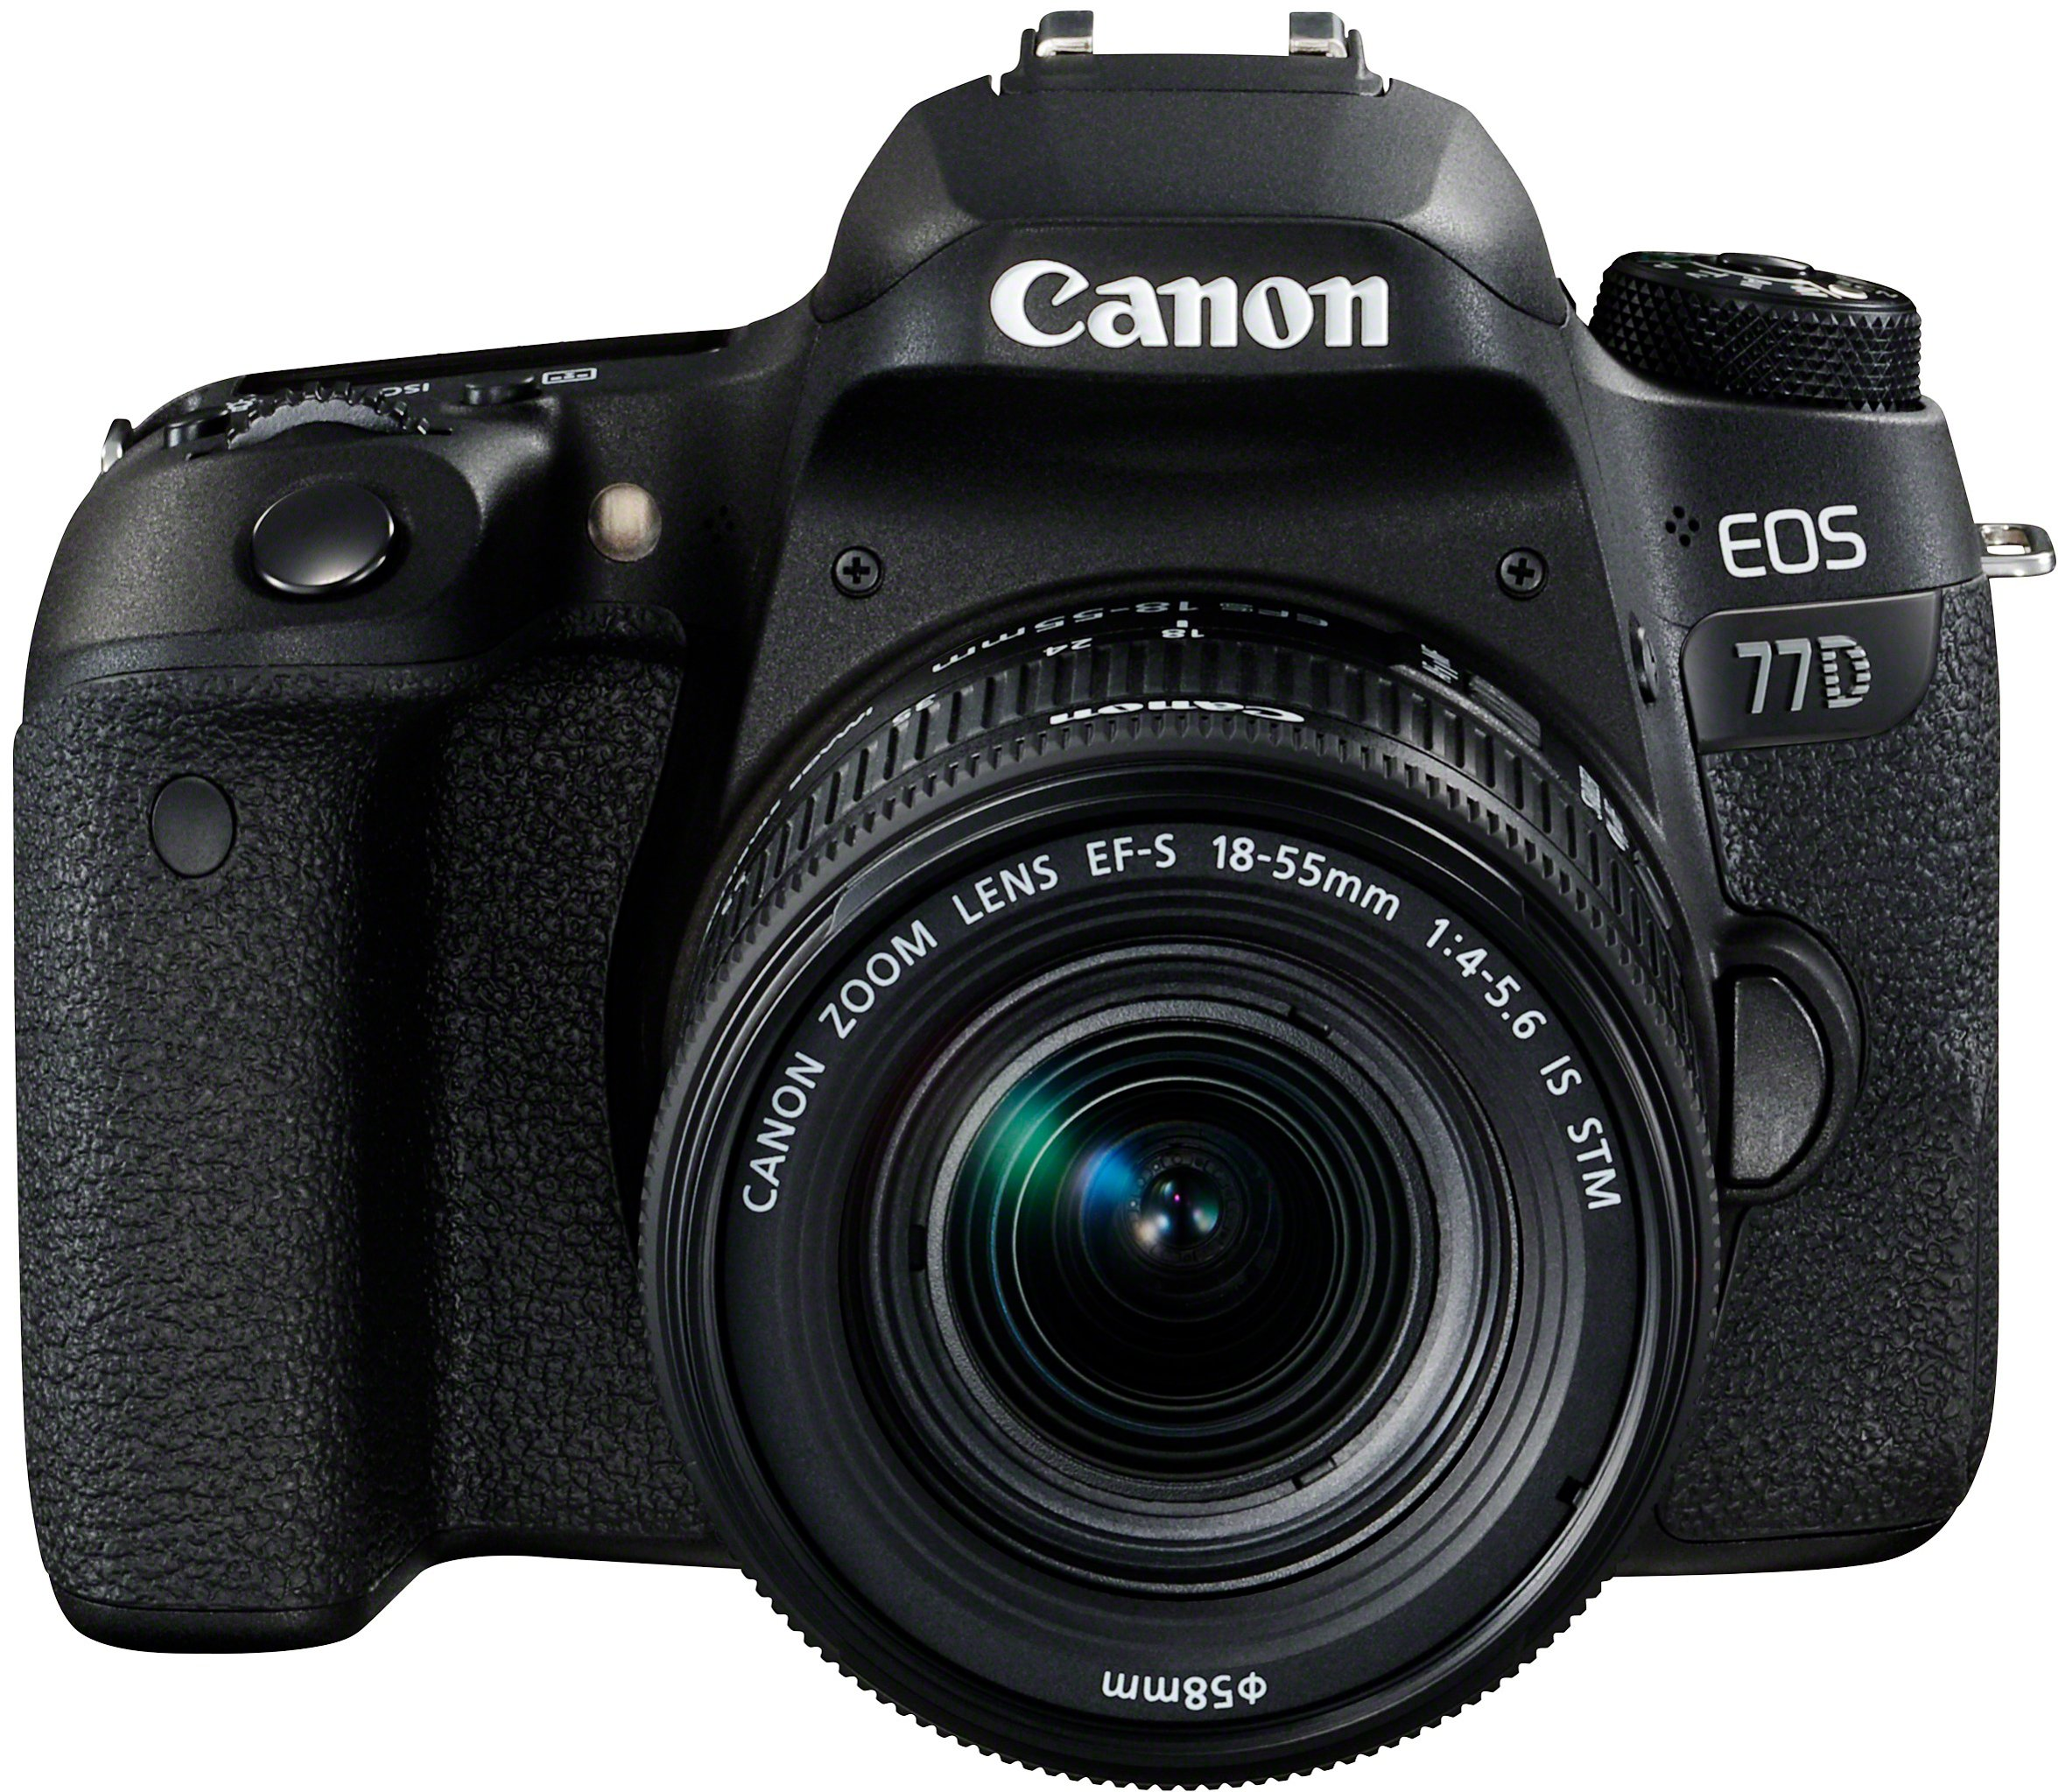 Am Besten Bewertete Produkte In Der Kategorie Digitale Canon Eos 70d 18 135mm Is Stm Wifi Paket 77d Slr Digitalkamera 242 Megapixel 77 Cm